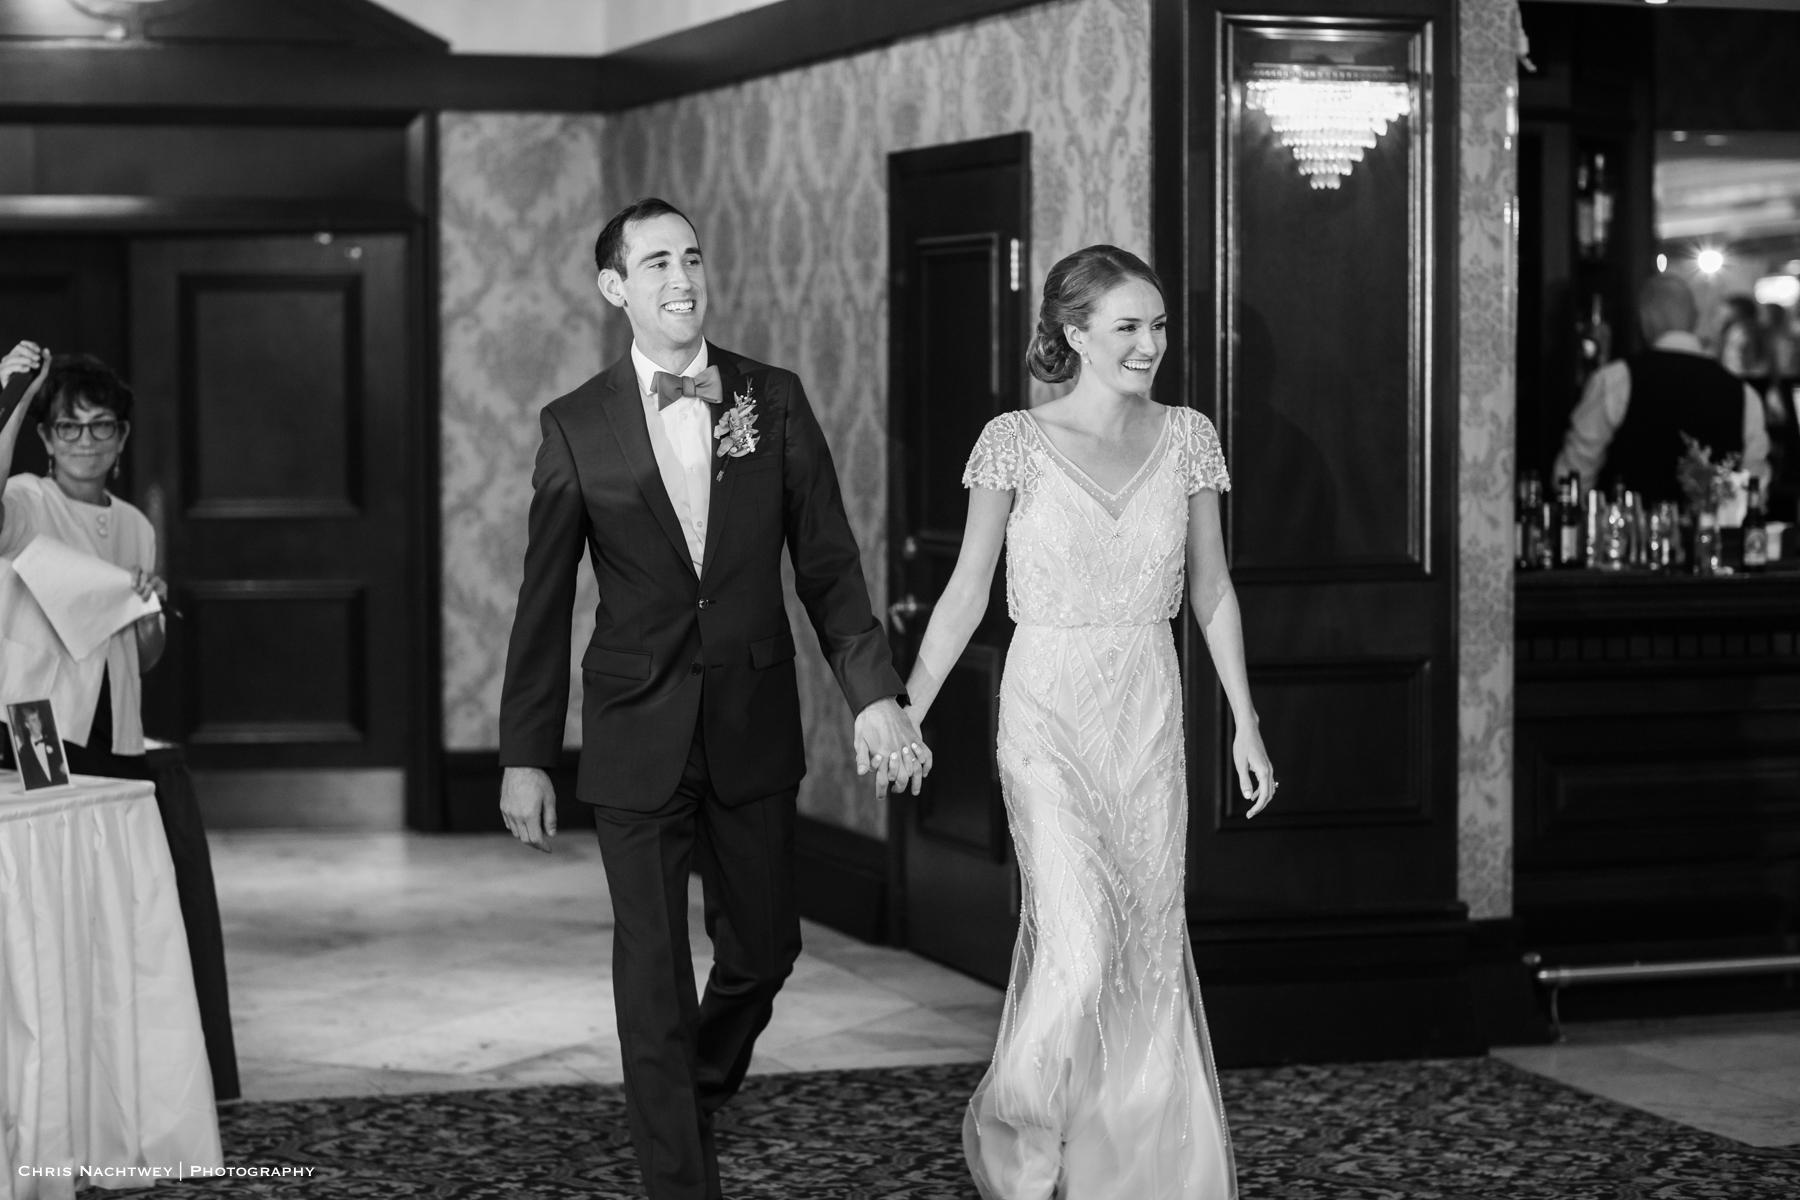 photos-wedding-quidnessett-country-club-ri-chris-nachtwey-photography-2018-48.jpg